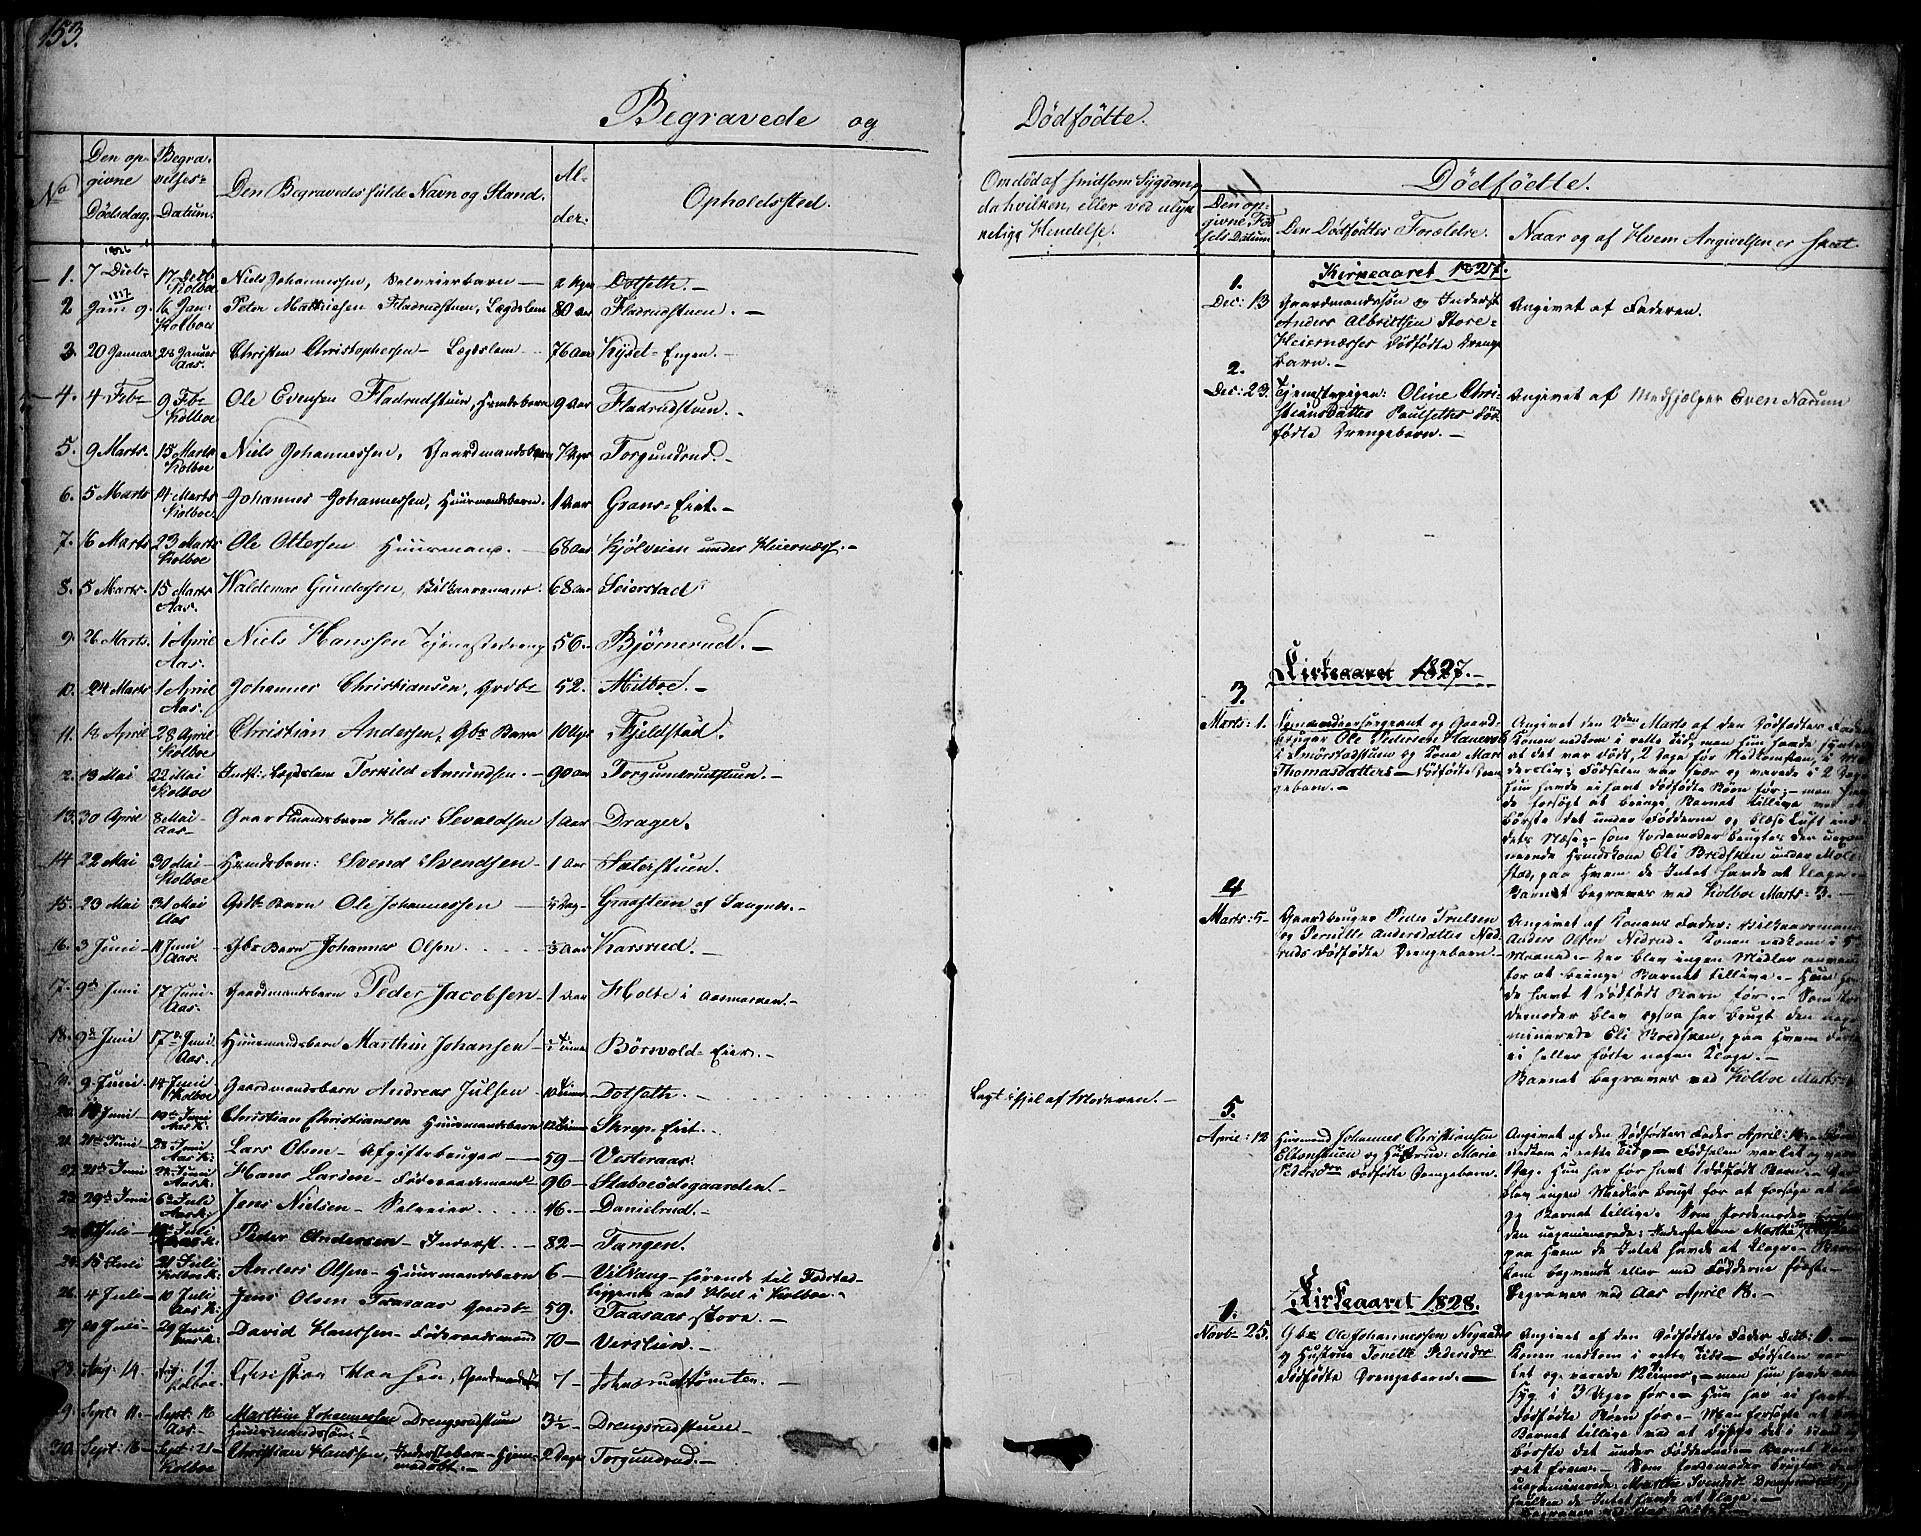 SAH, Vestre Toten prestekontor, H/Ha/Haa/L0002: Ministerialbok nr. 2, 1825-1837, s. 153